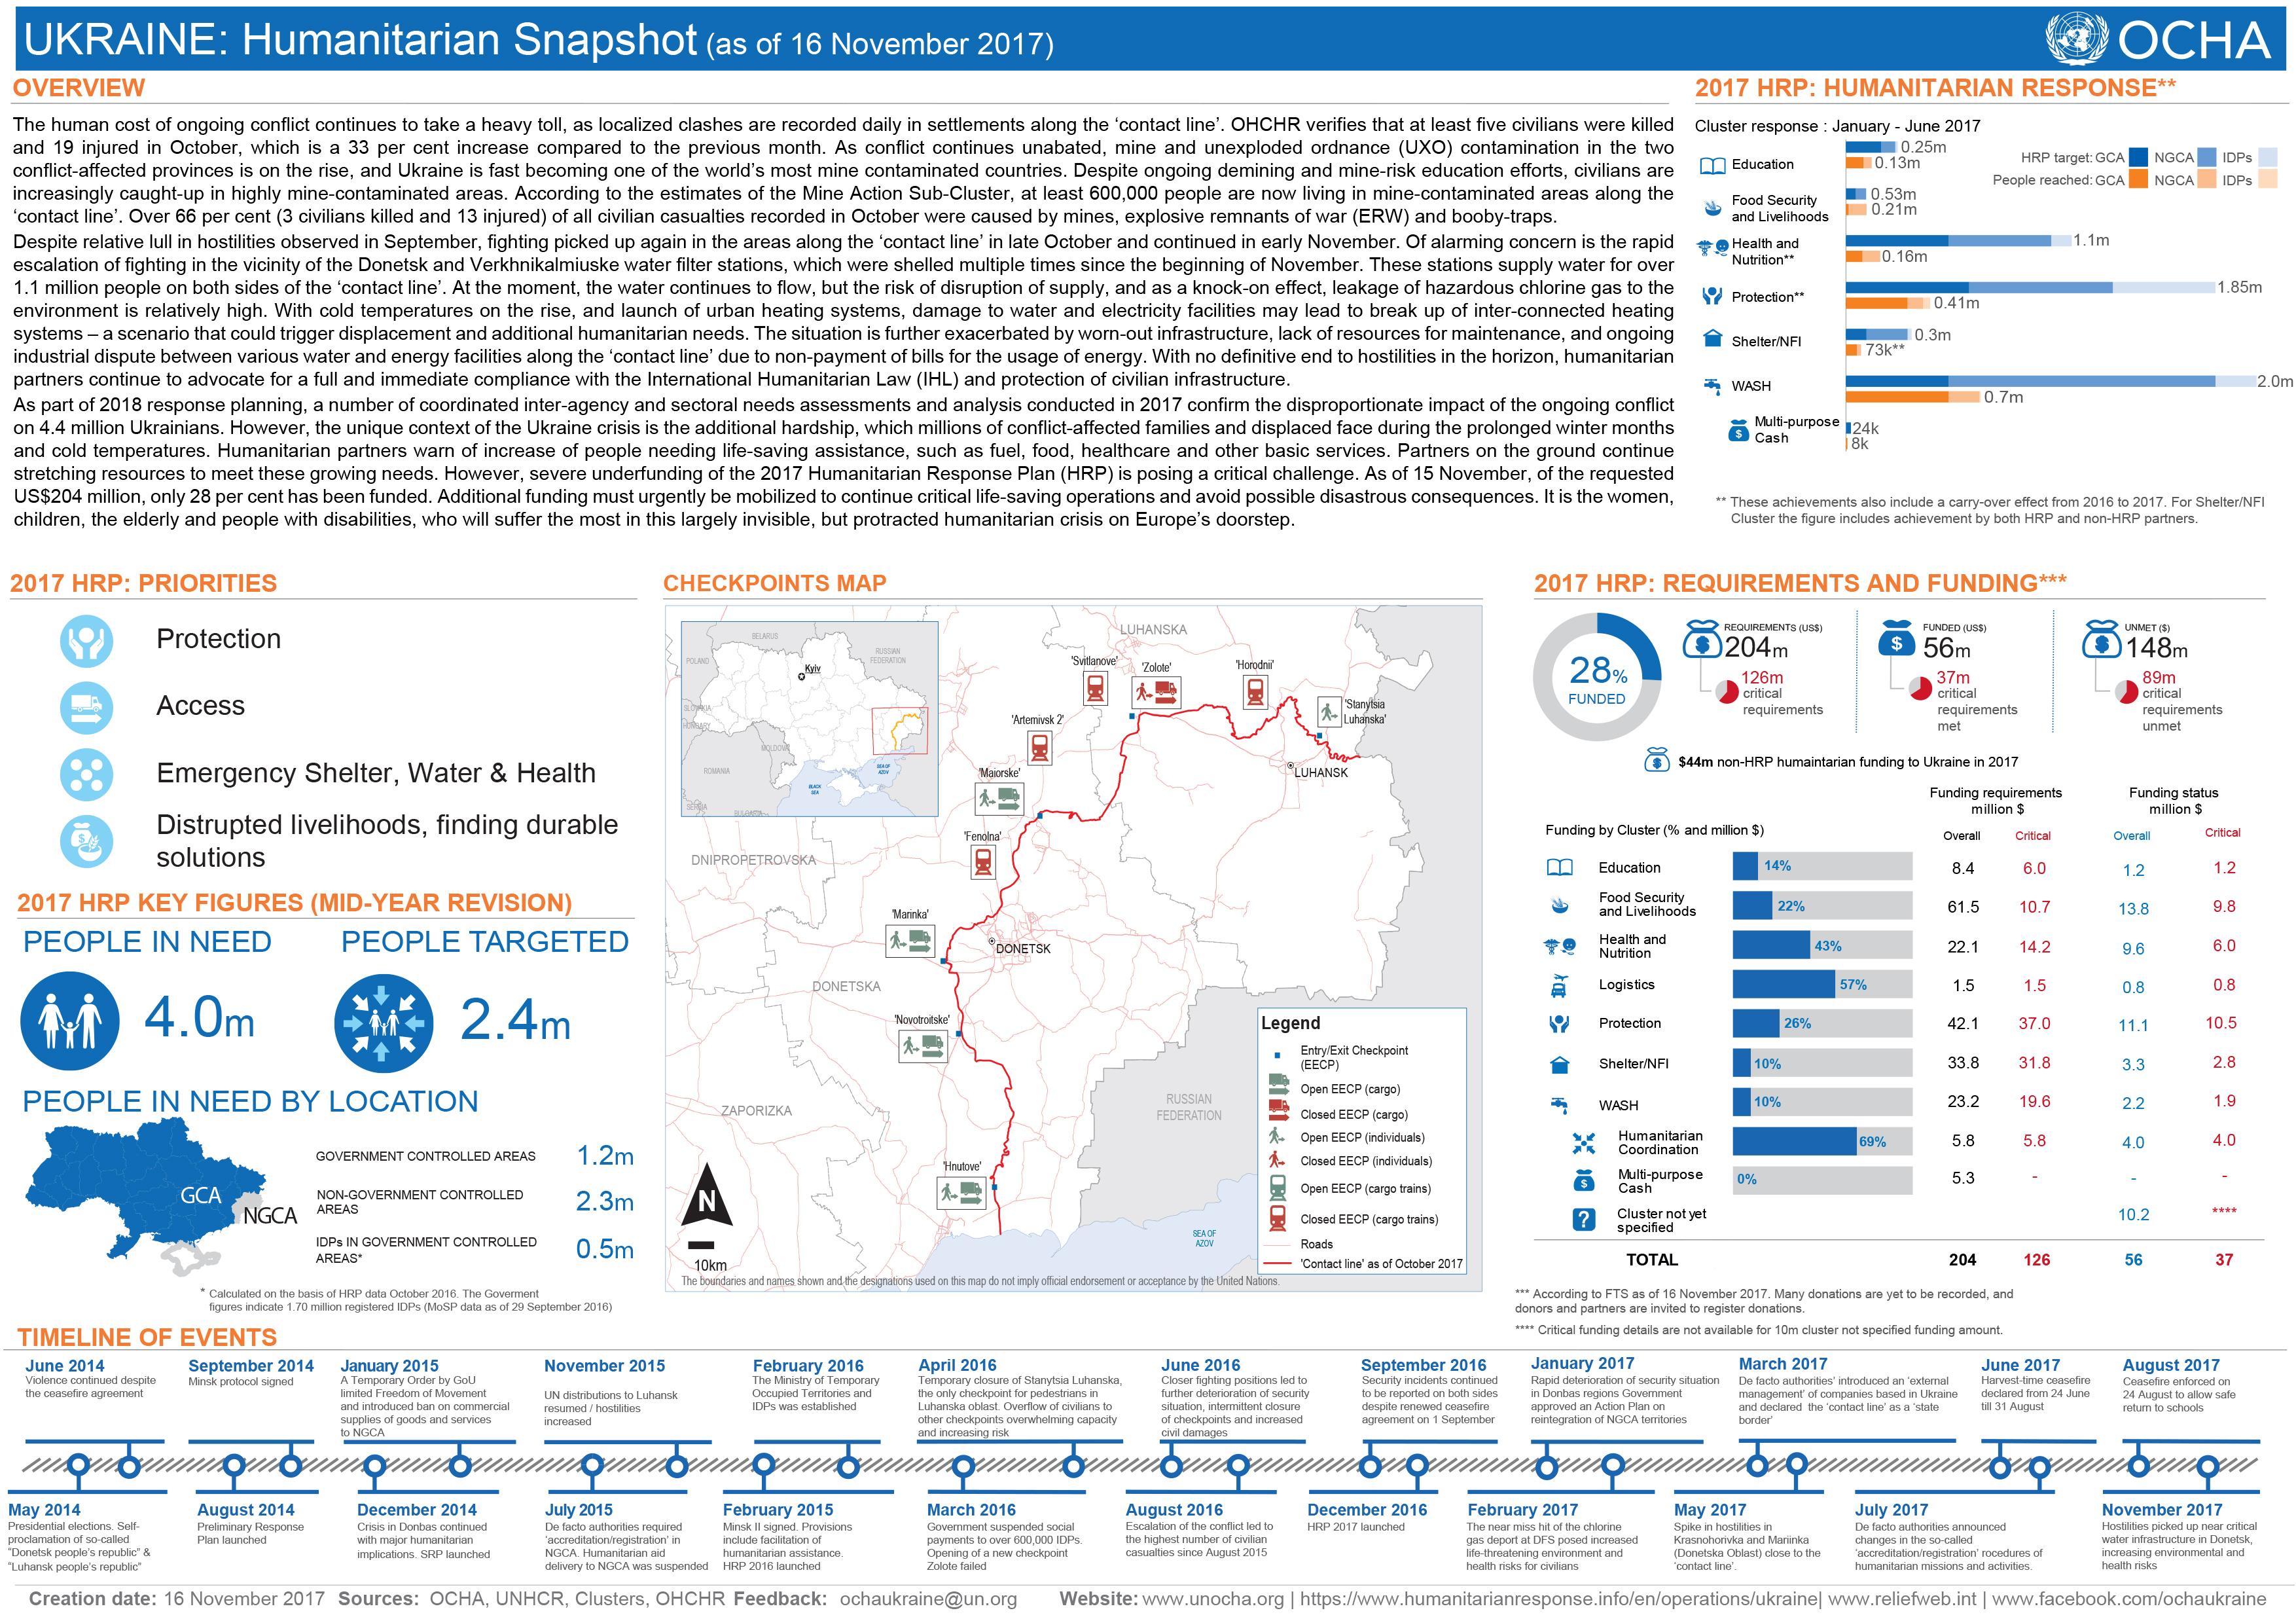 Ukraine: Humanitarian Snapshot (as of 16 November 2017)